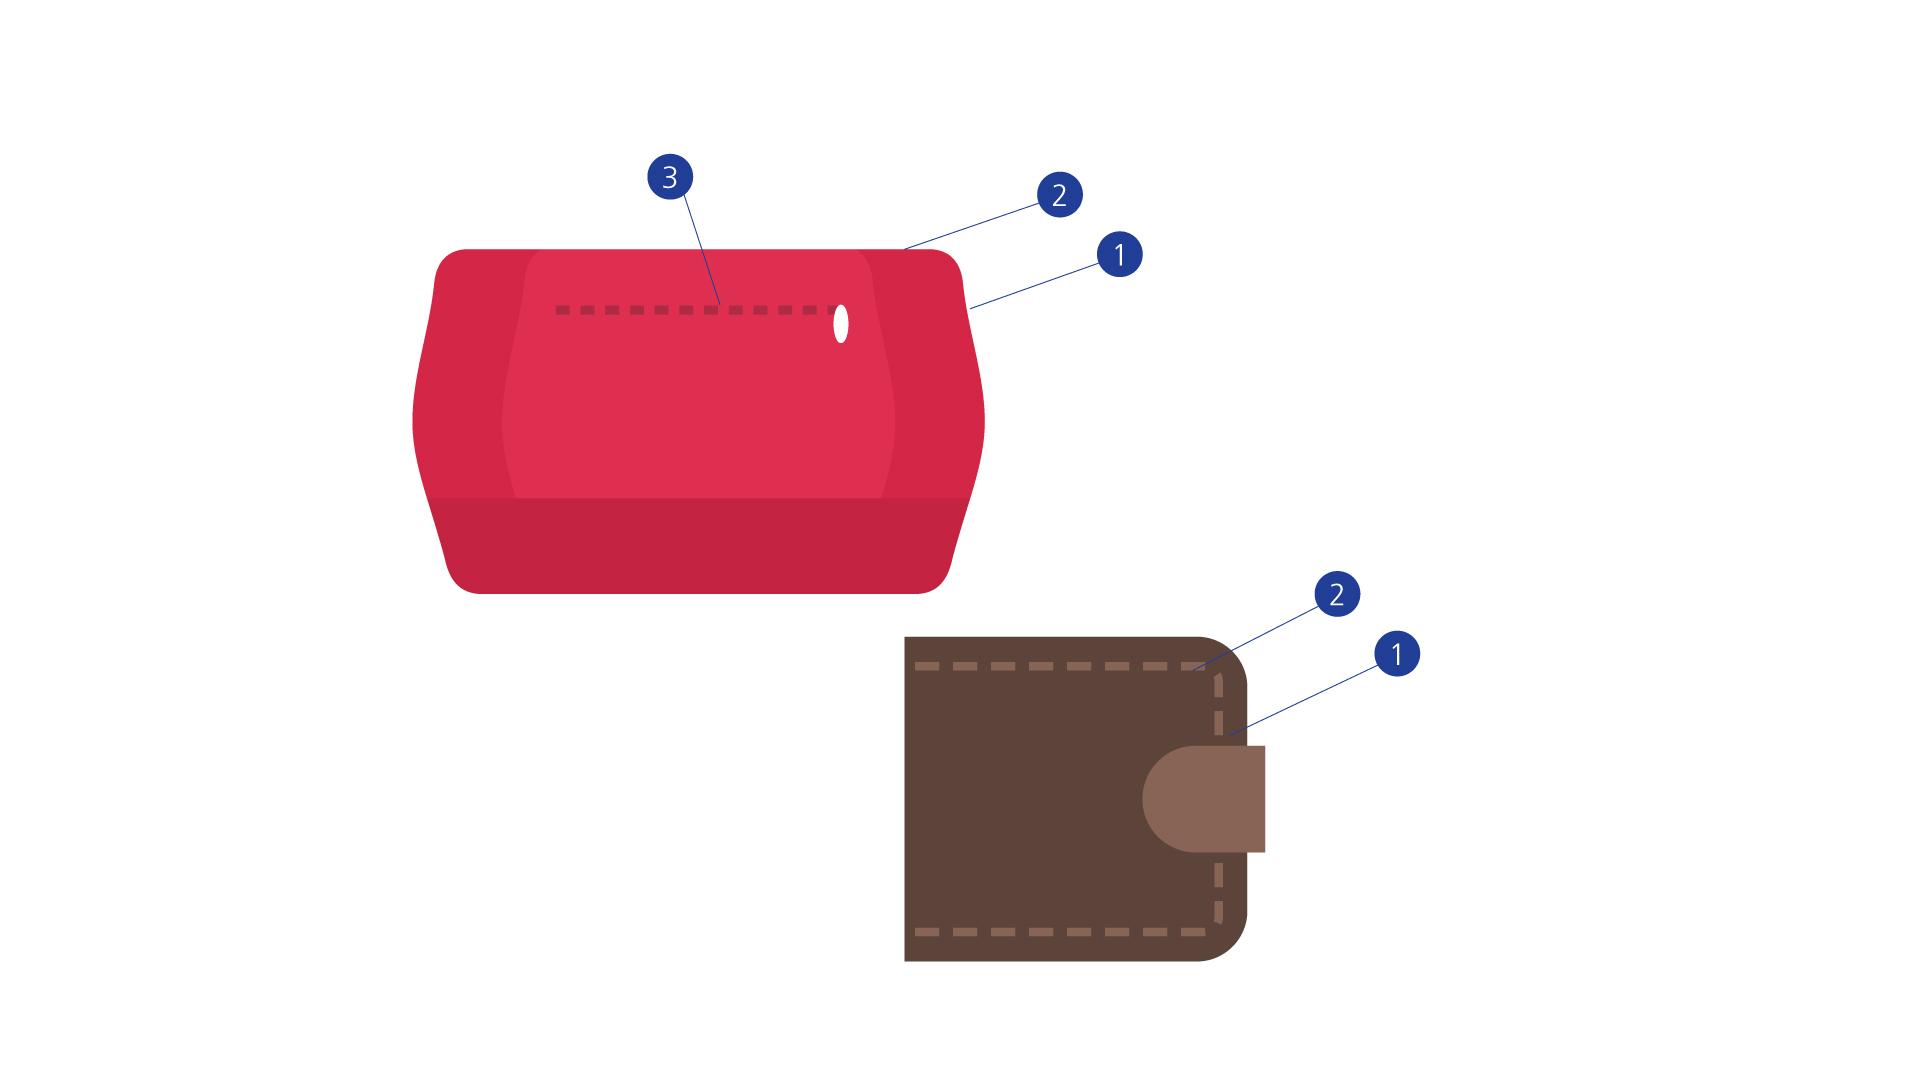 medium resolution of purses and wallets diagram